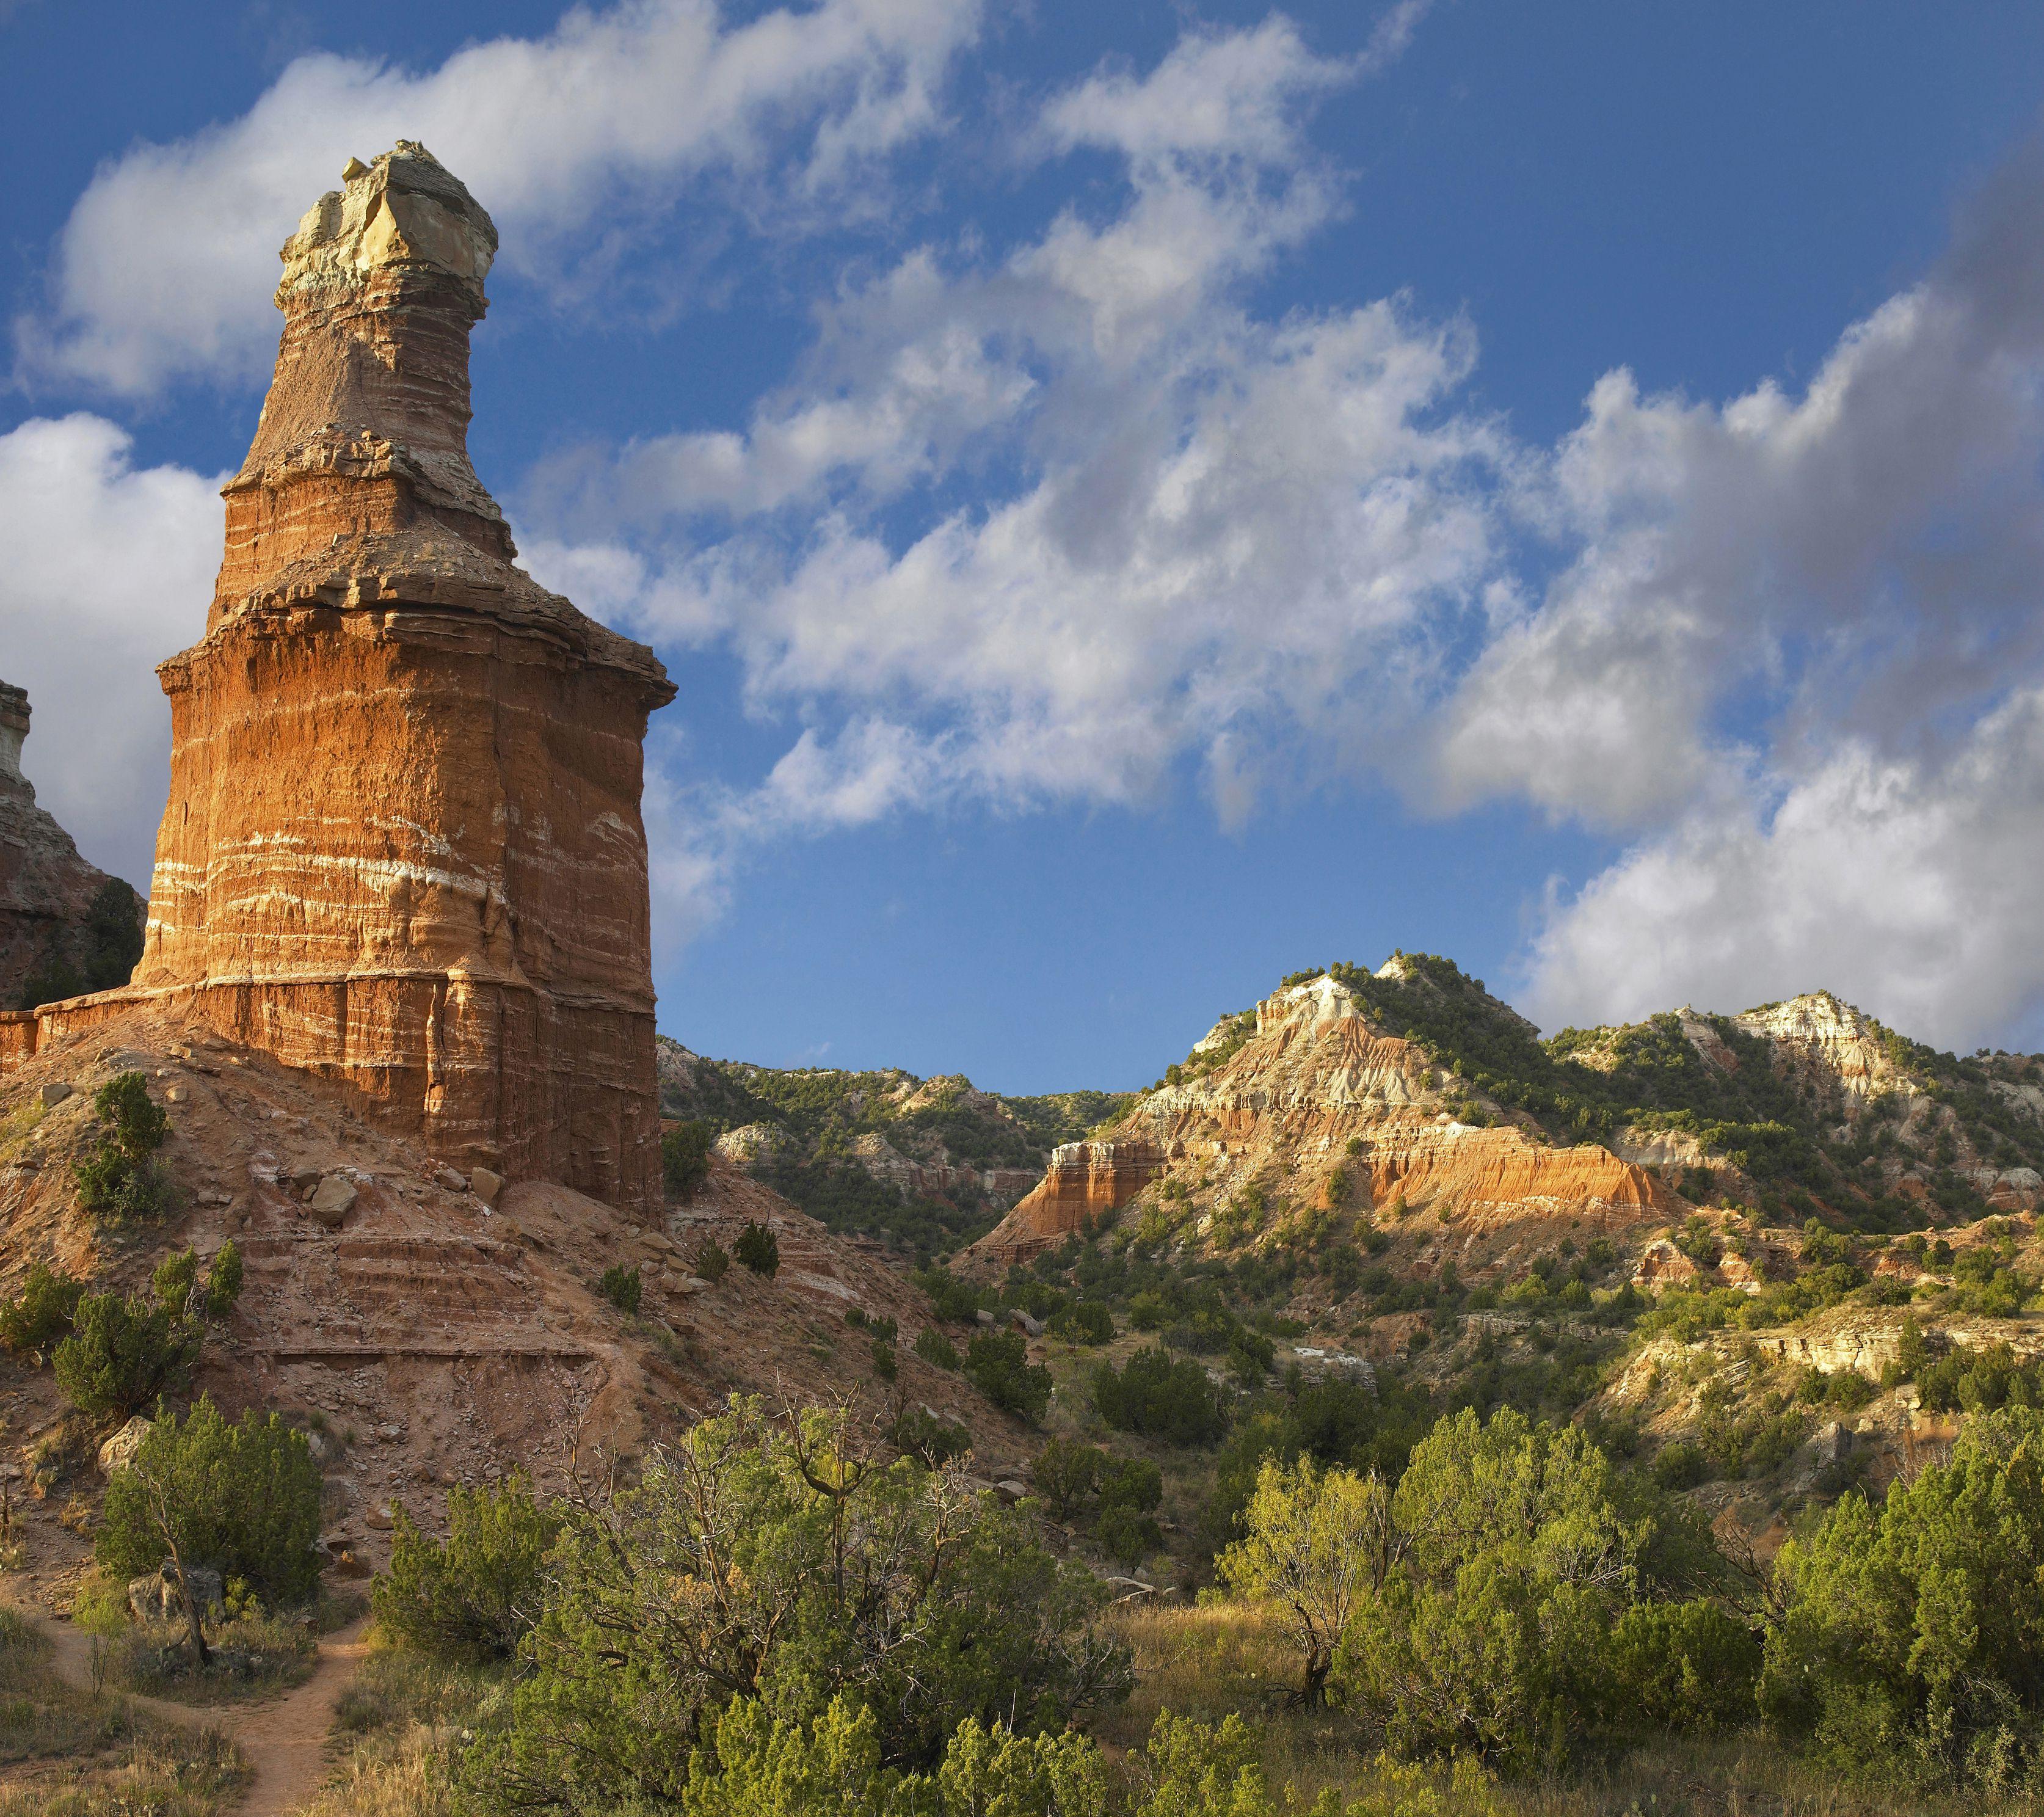 Lighthouse, Palo Duro Canyon State Park, Texas, USA